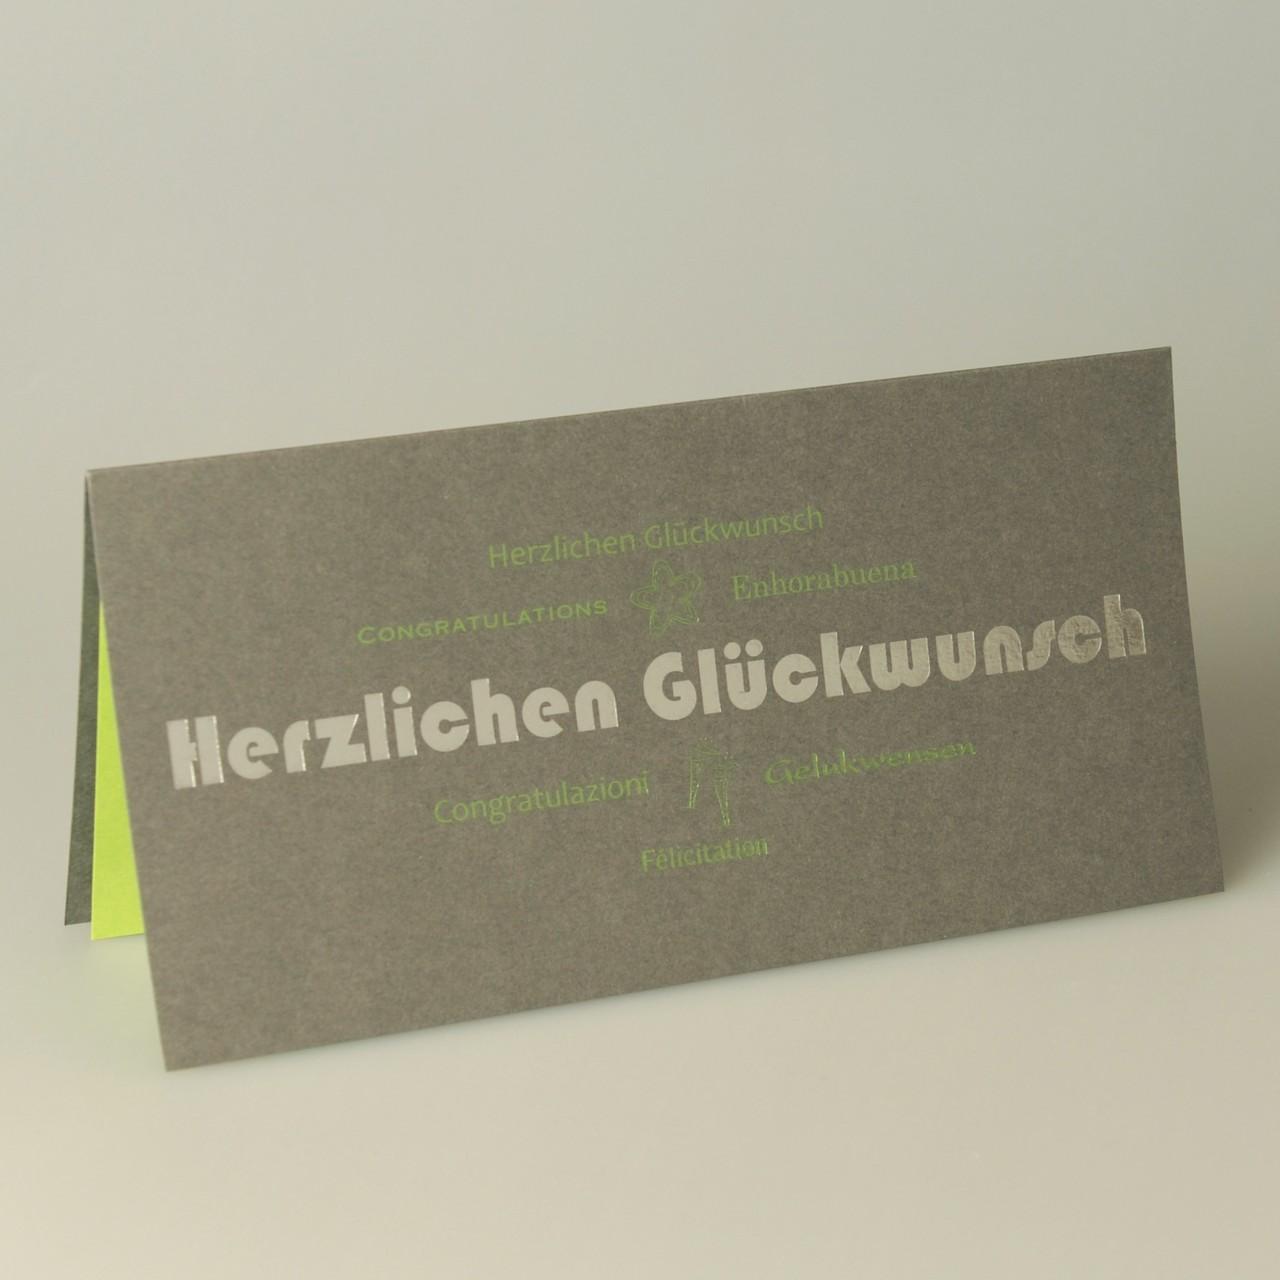 Glückwunschkarte - A 3804